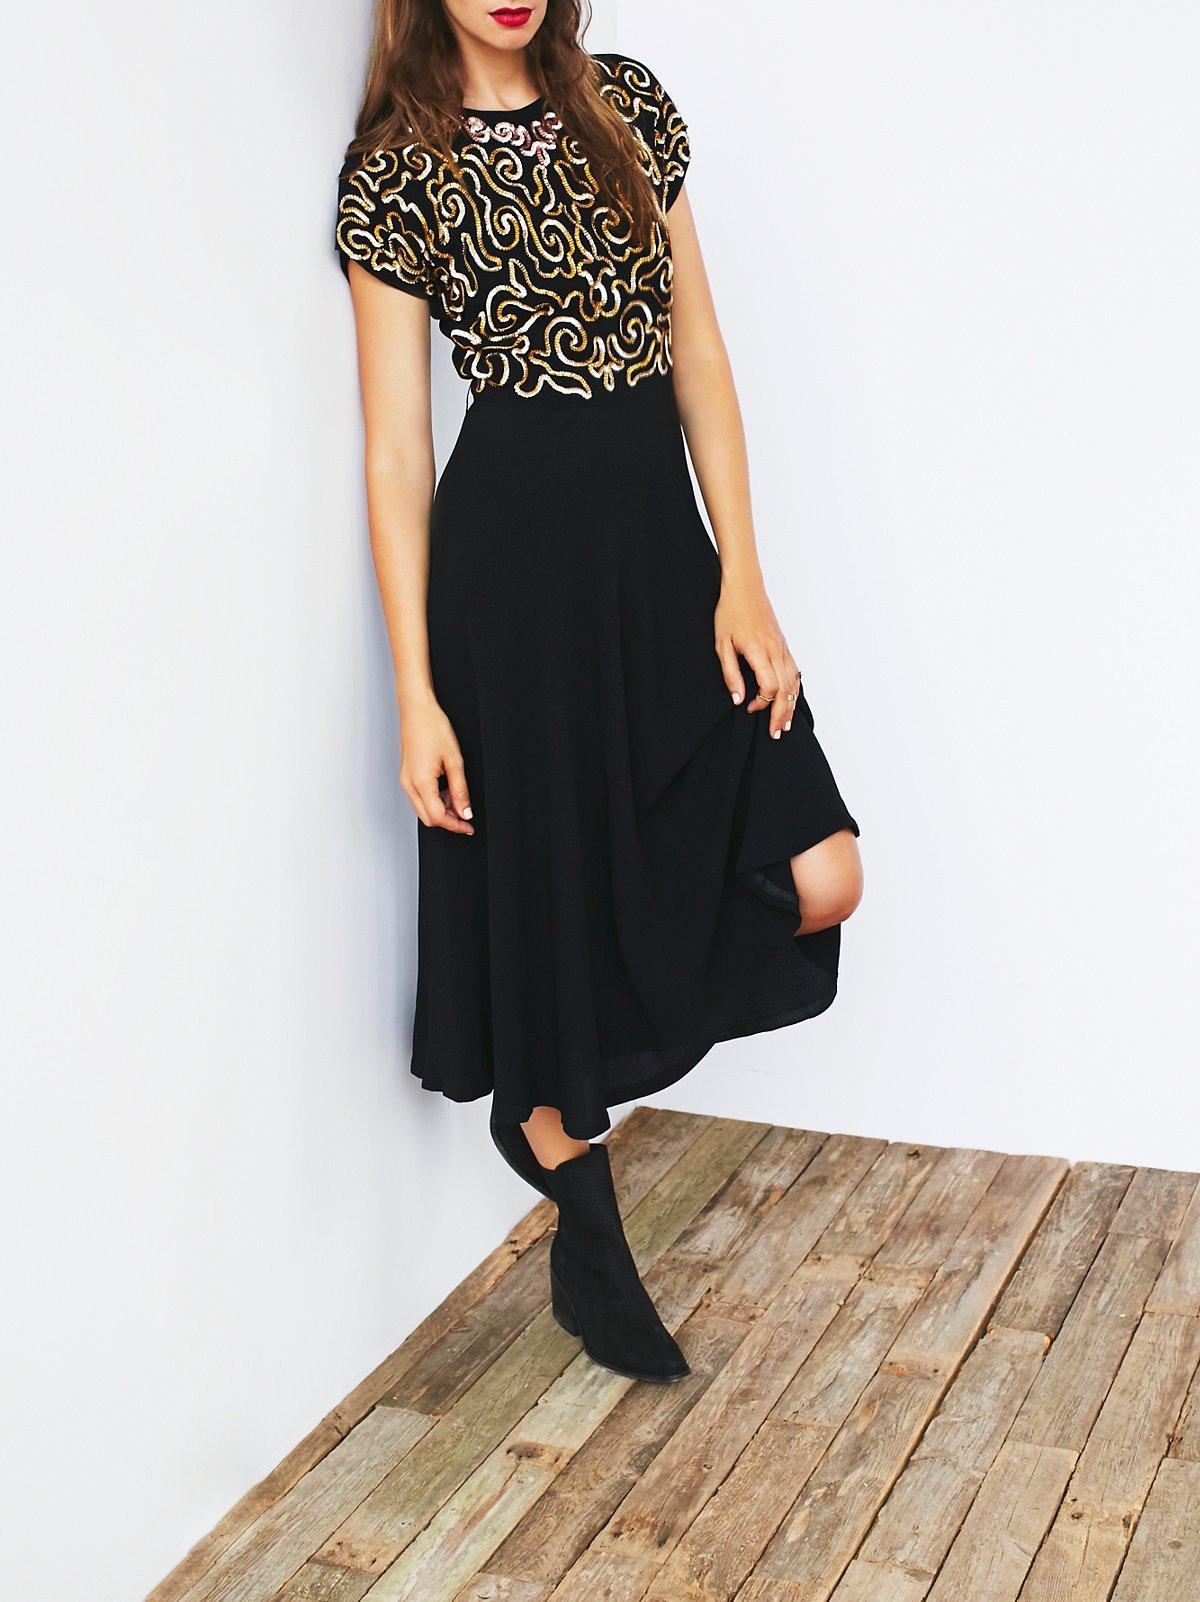 Vintage 1930s Crepe Dress